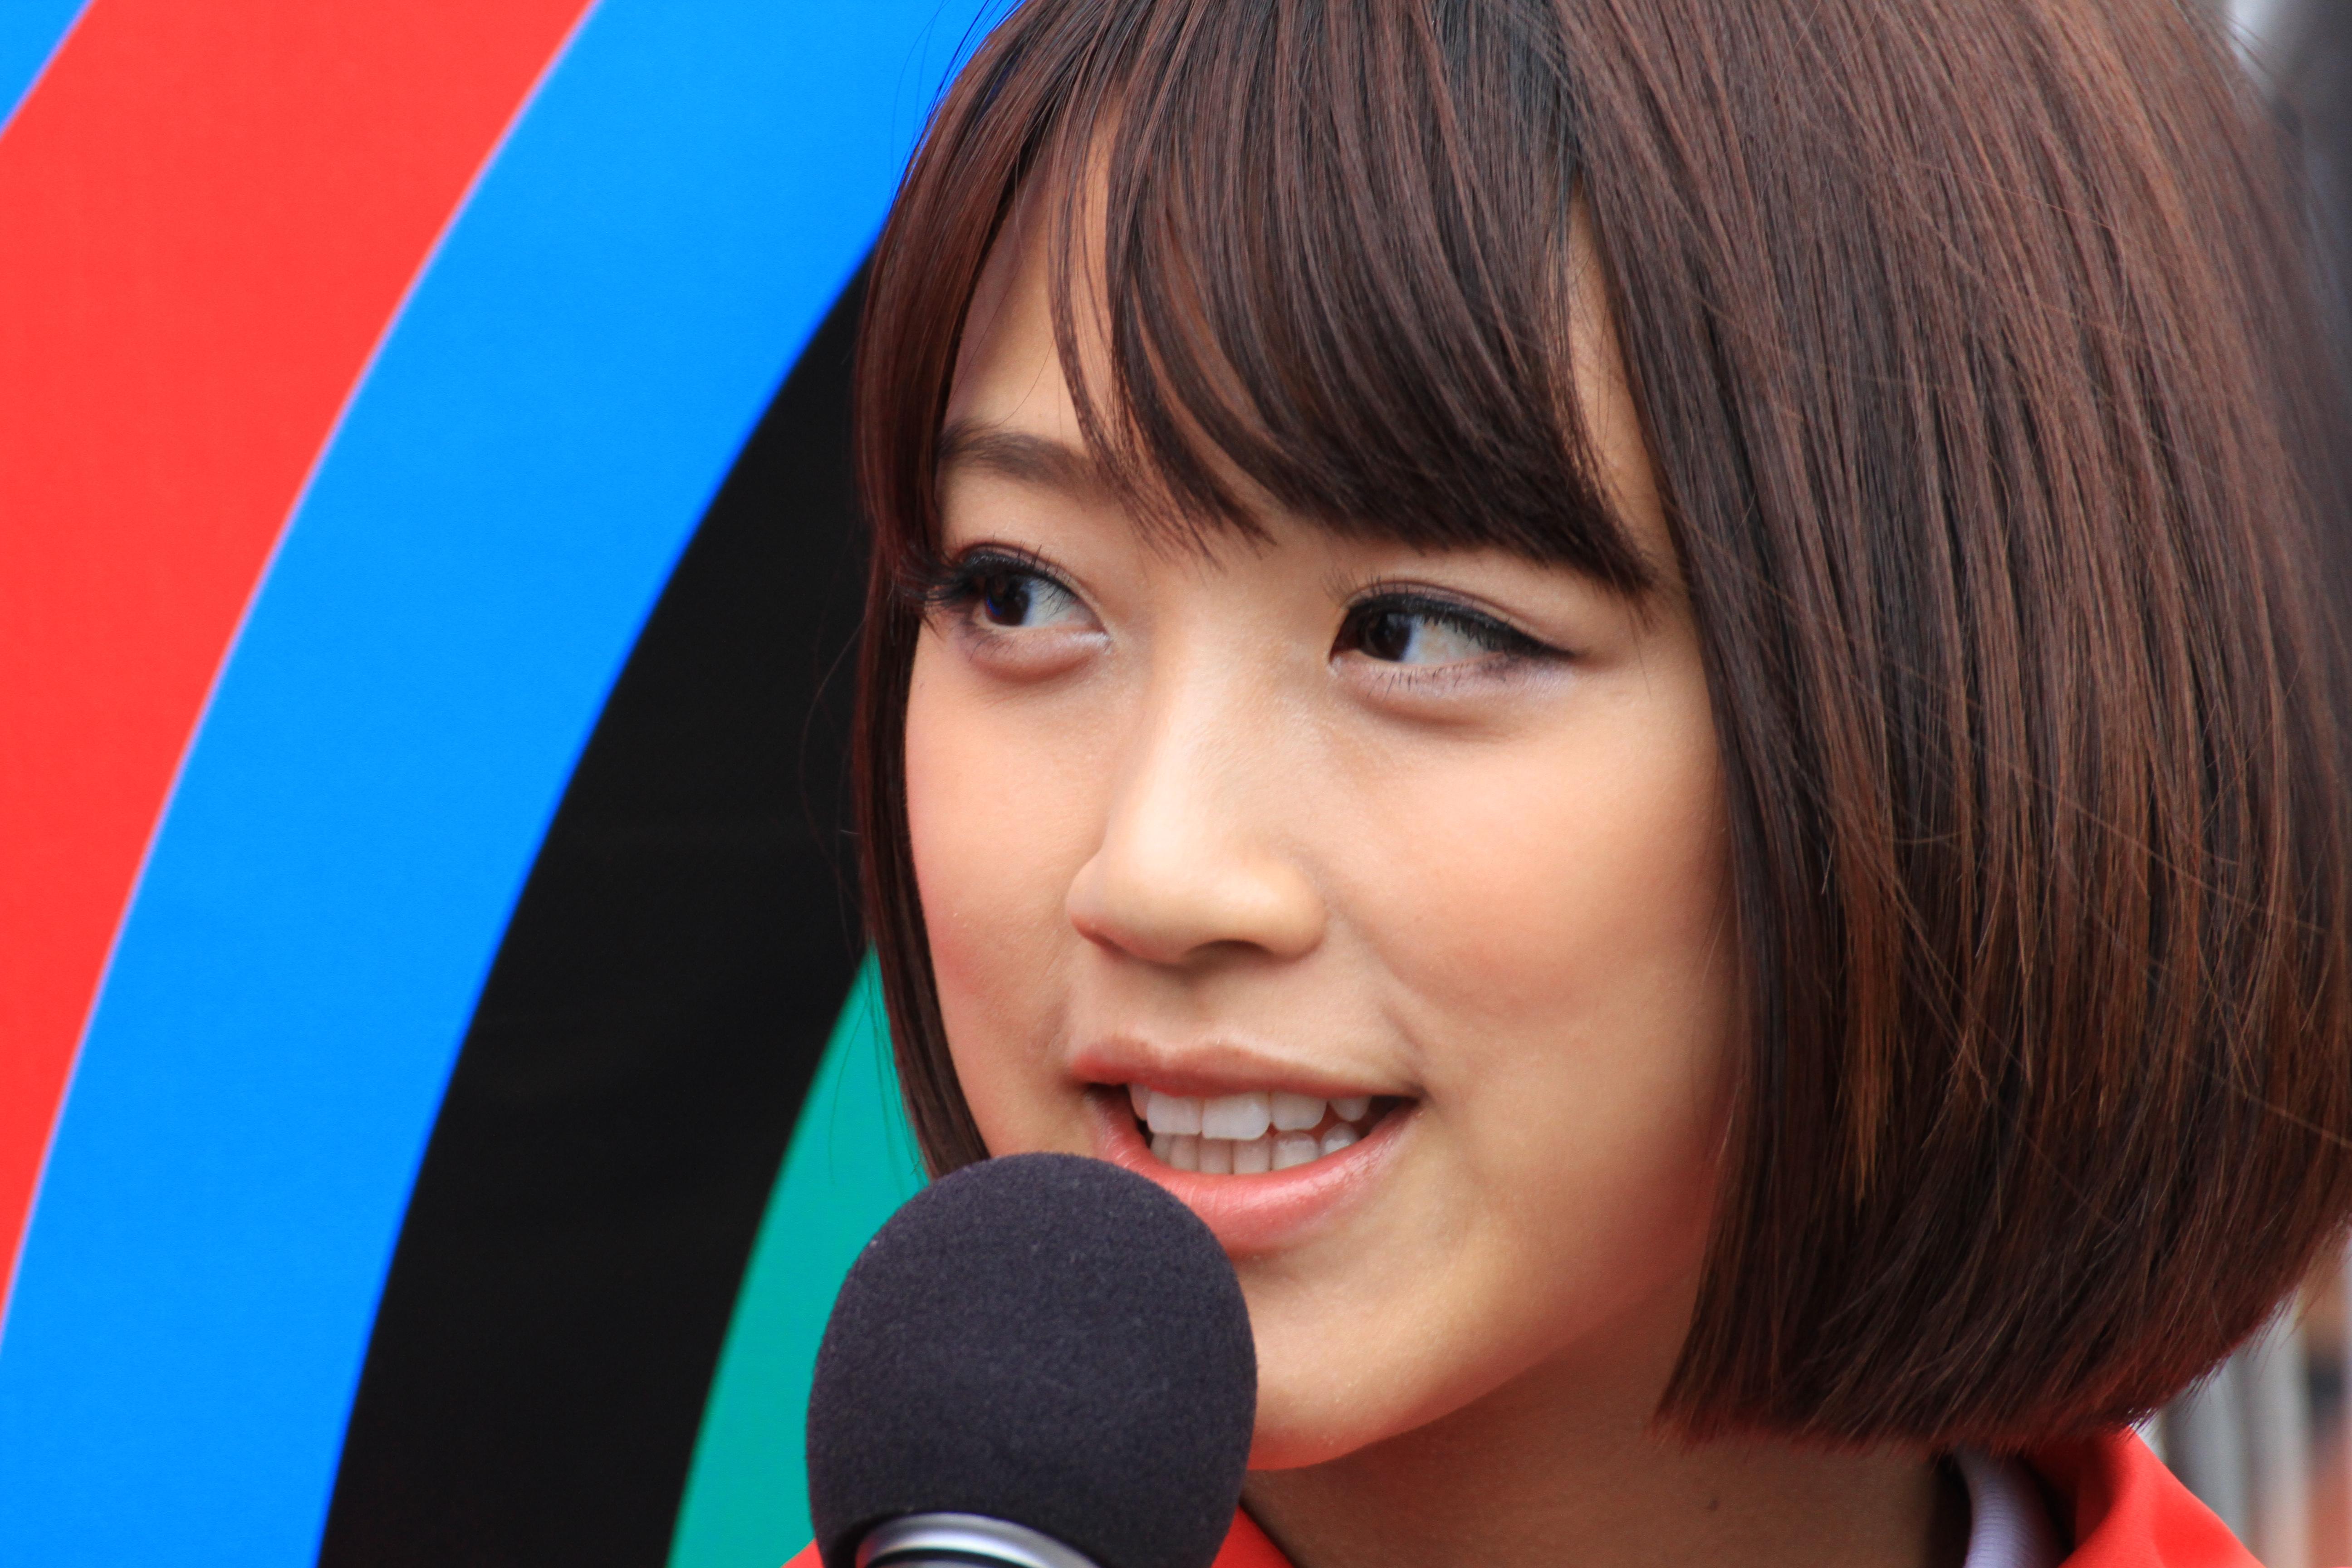 竹内由恵 - Wikipedia